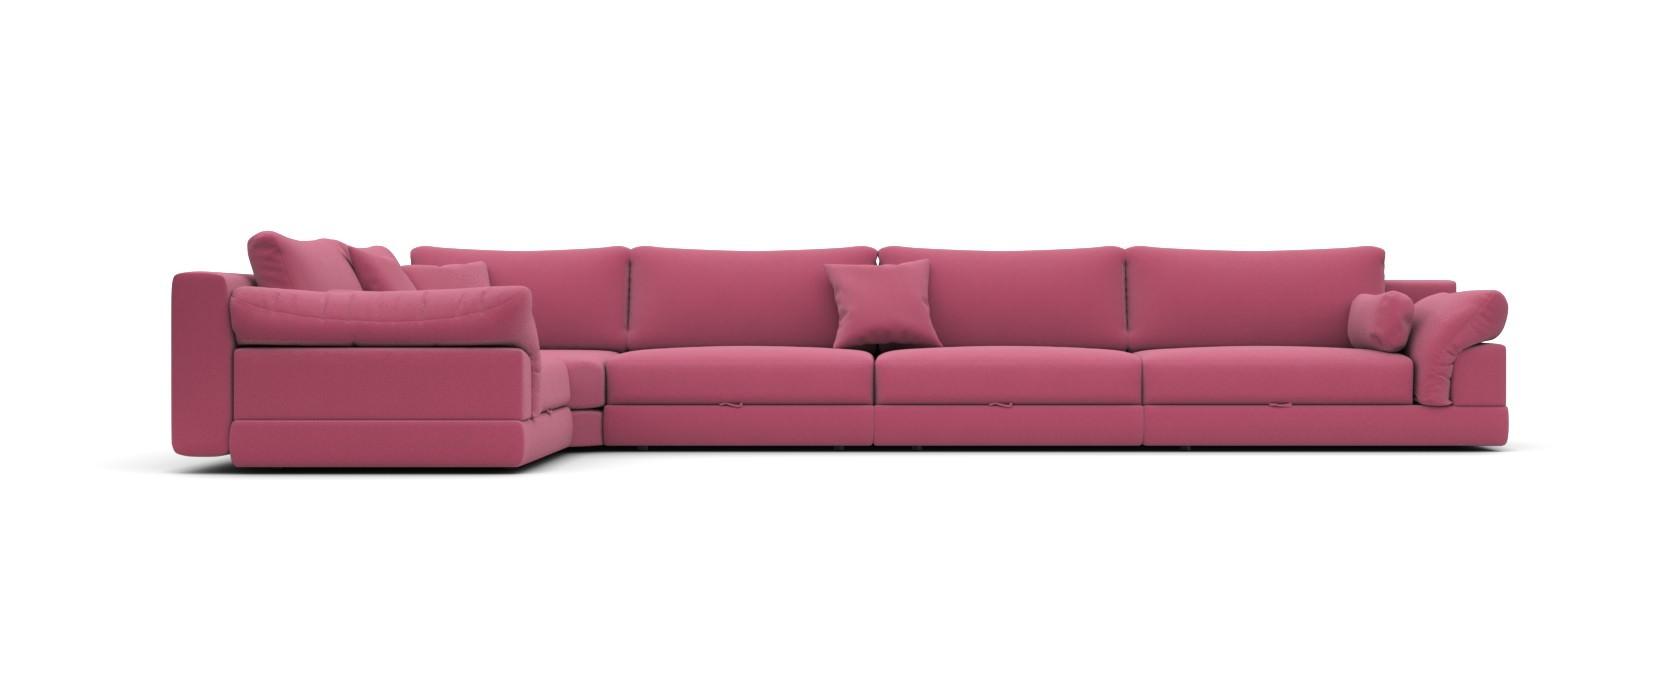 Модульний диван Claudia 455x255 - Pufetto